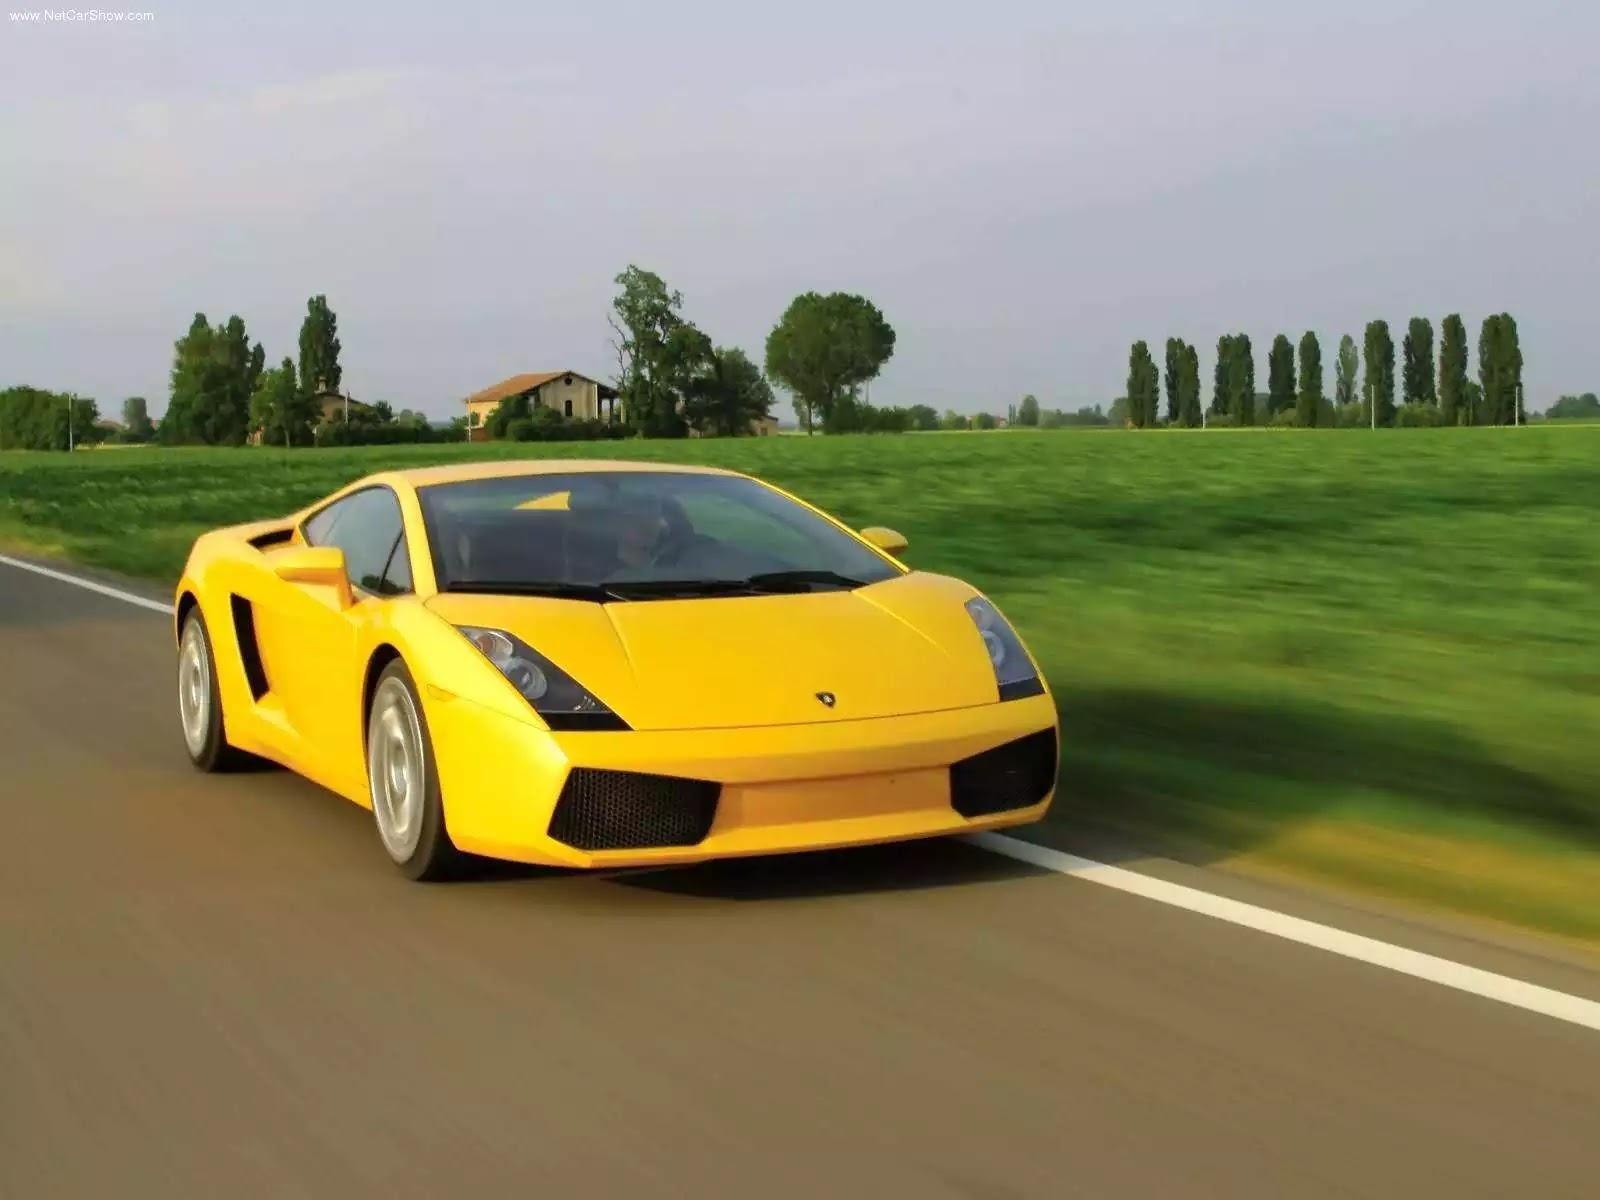 Hình ảnh siêu xe Lamborghini Gallardo 2003 & nội ngoại thất